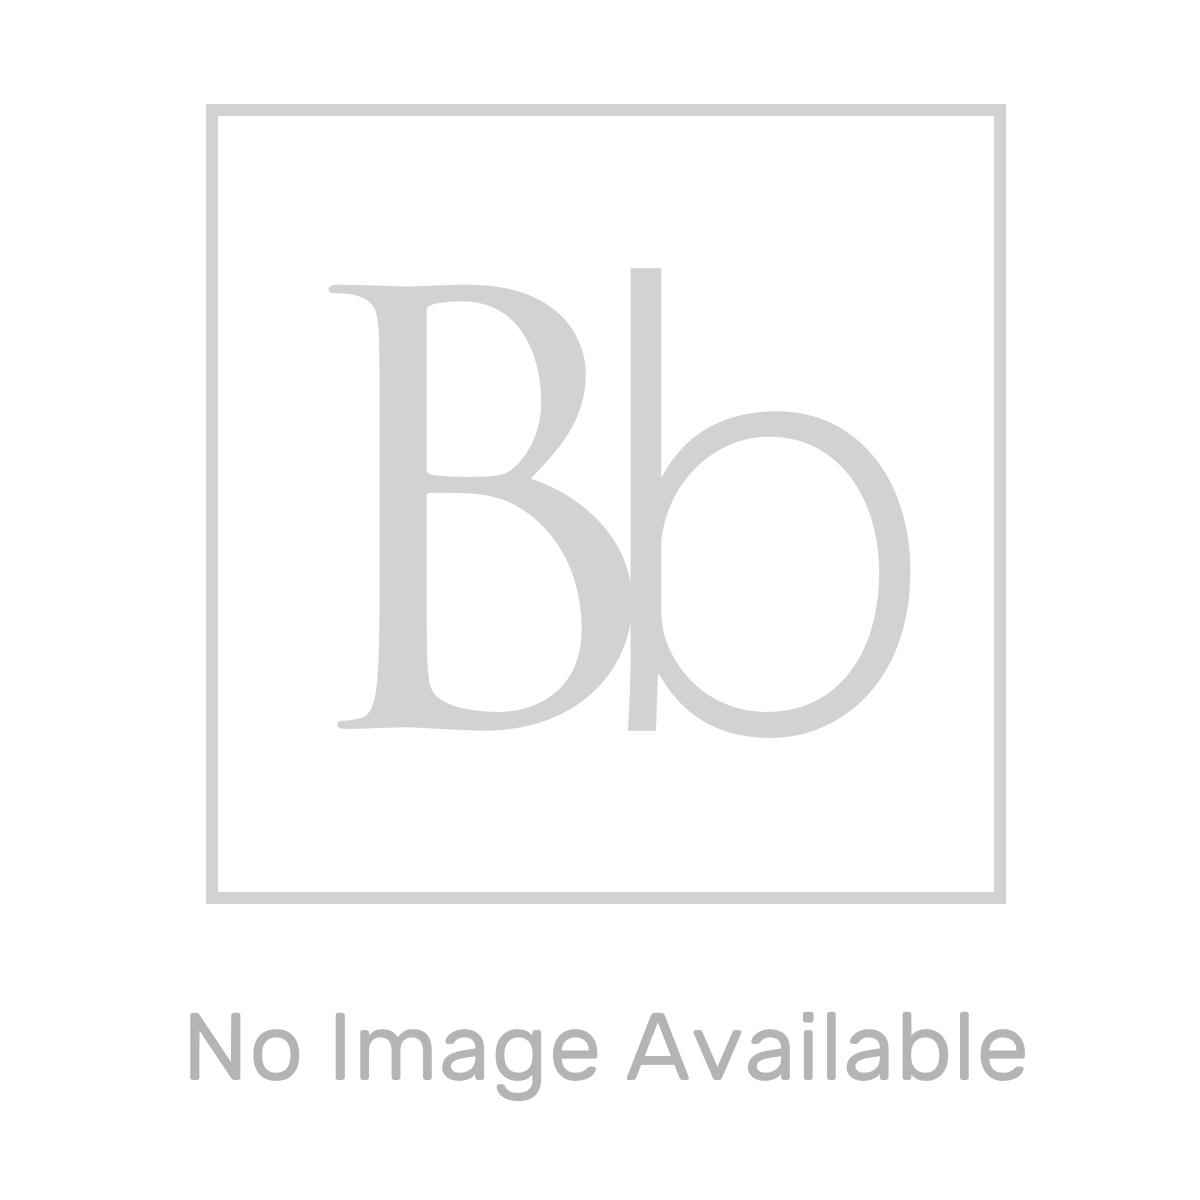 Croydex Bobbing Along Phthalate Free PVC Shower Curtain